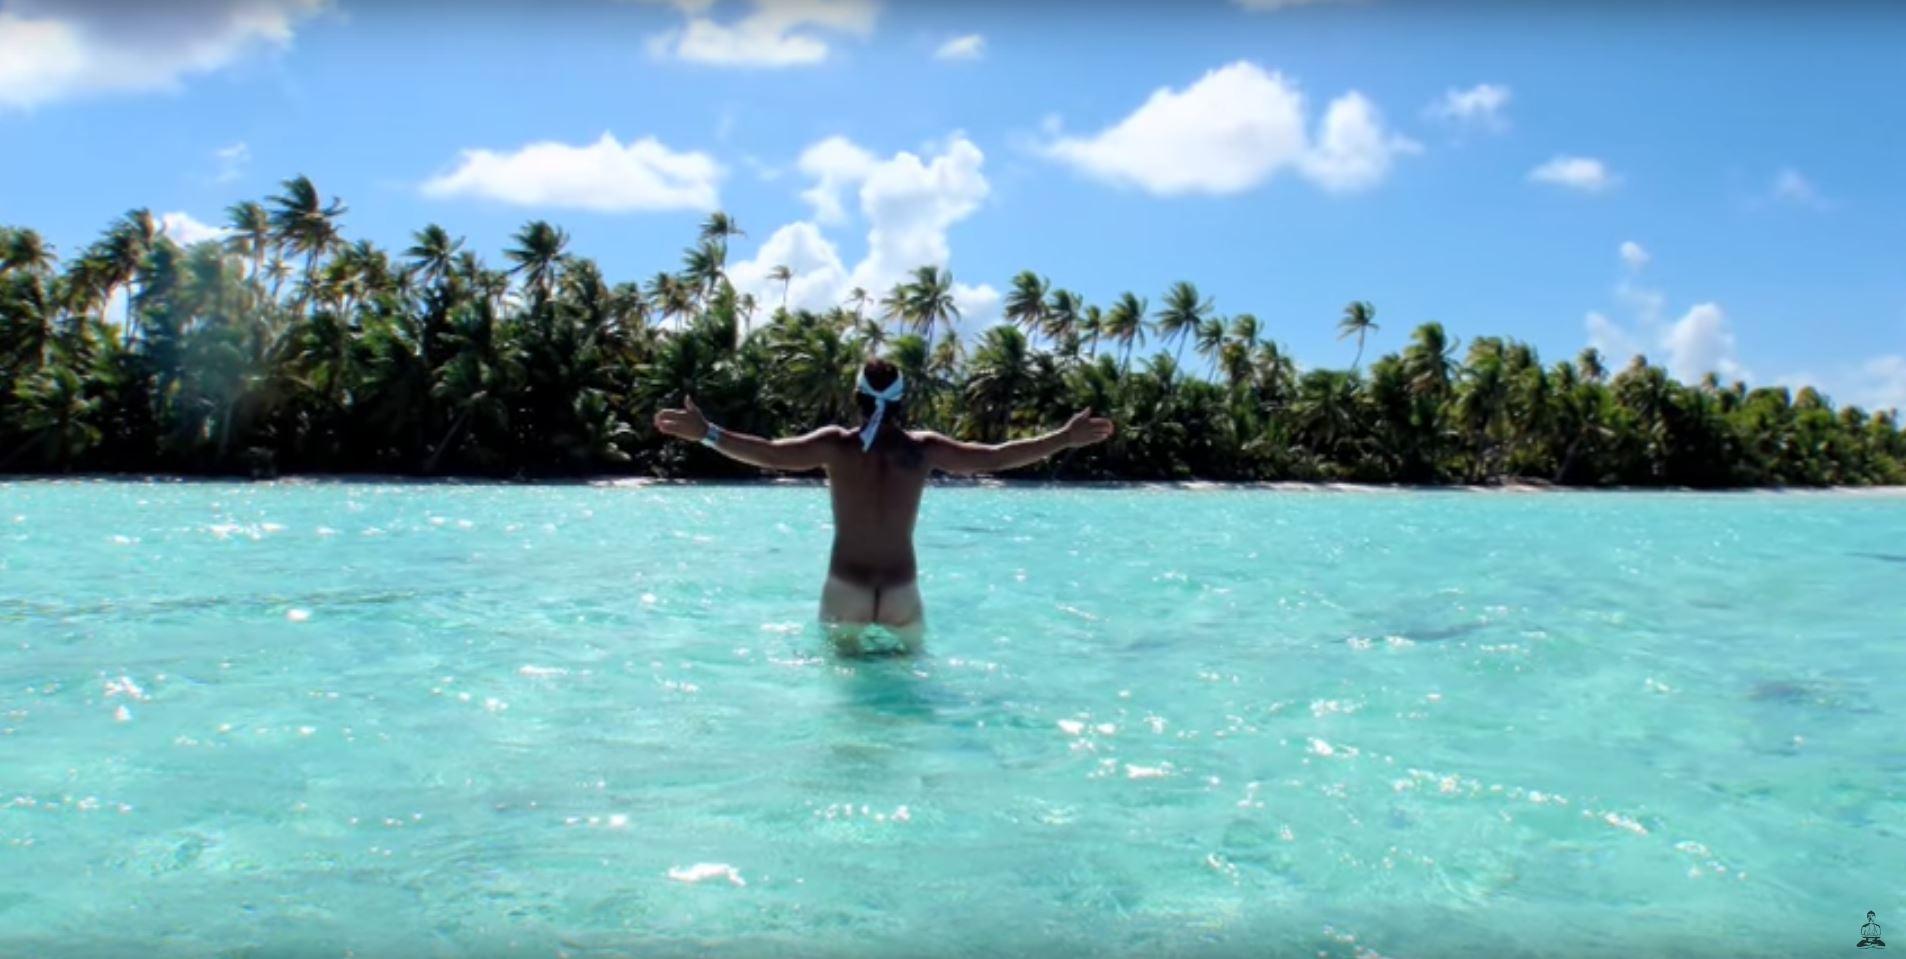 sailing Tuamotu Archipelago french polynesia